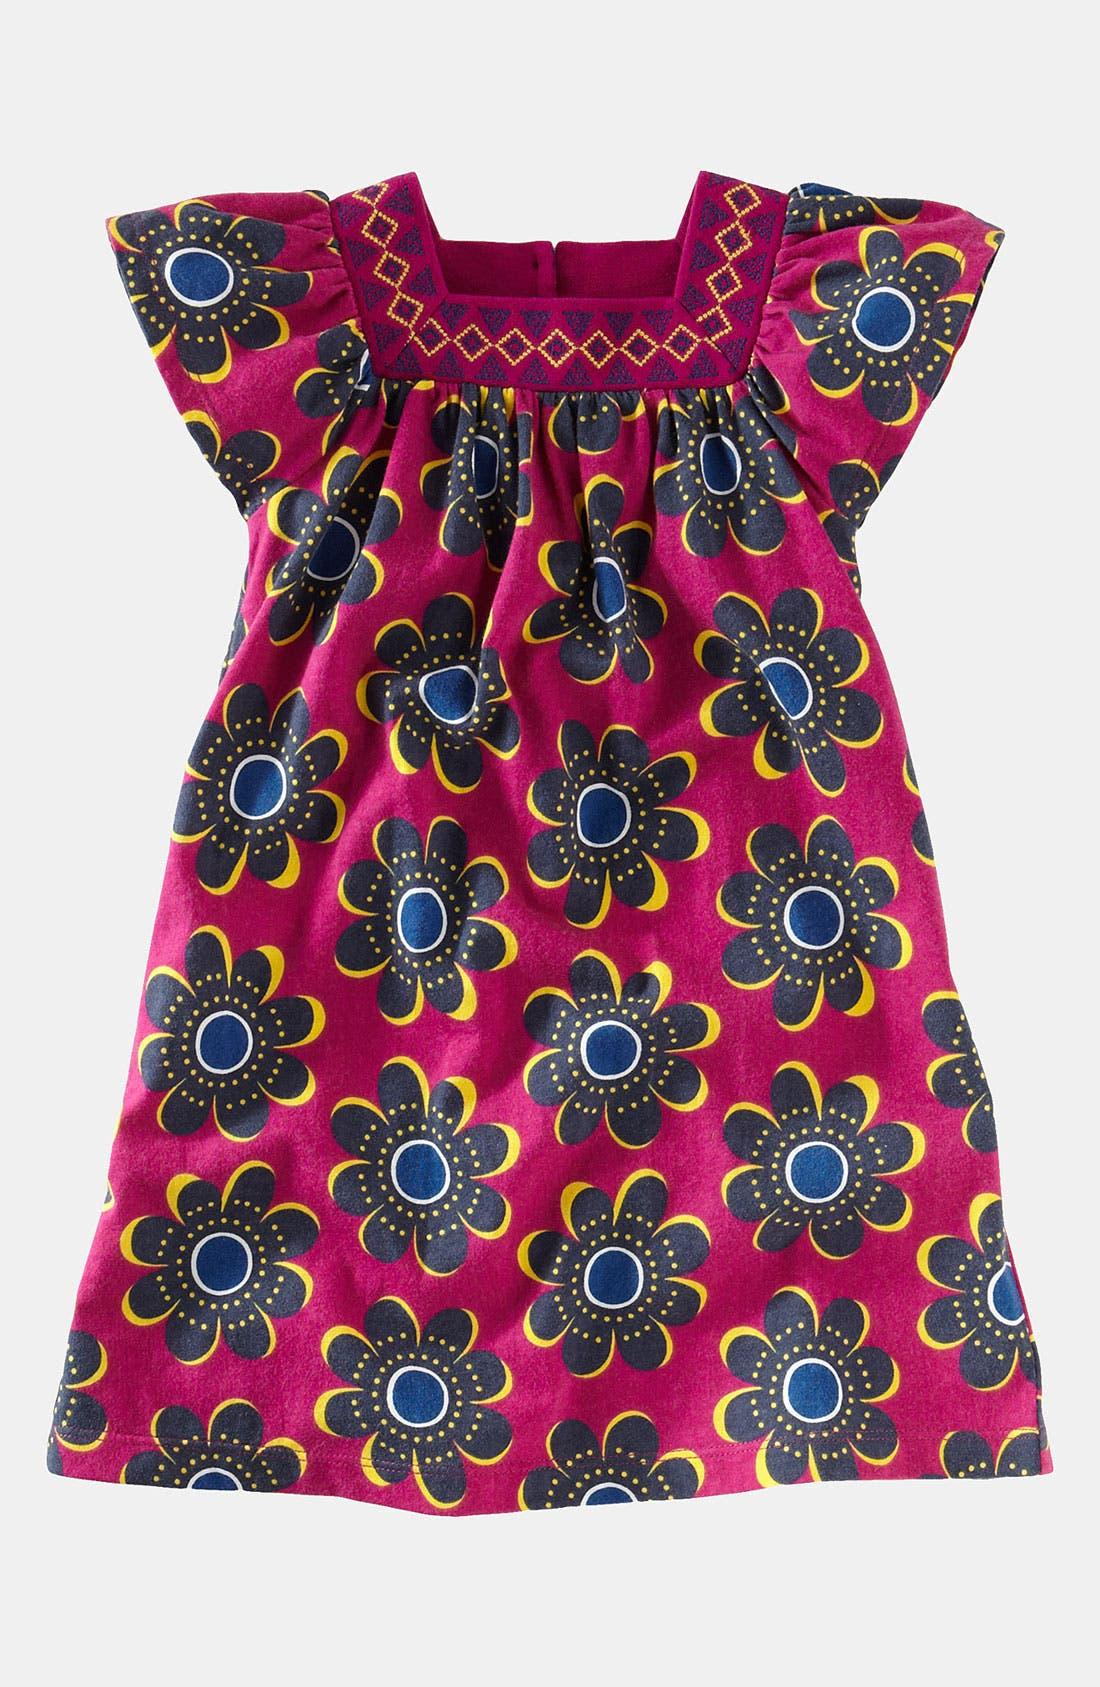 Alternate Image 1 Selected - Tea Collection 'Rosebank' Dress (Toddler)